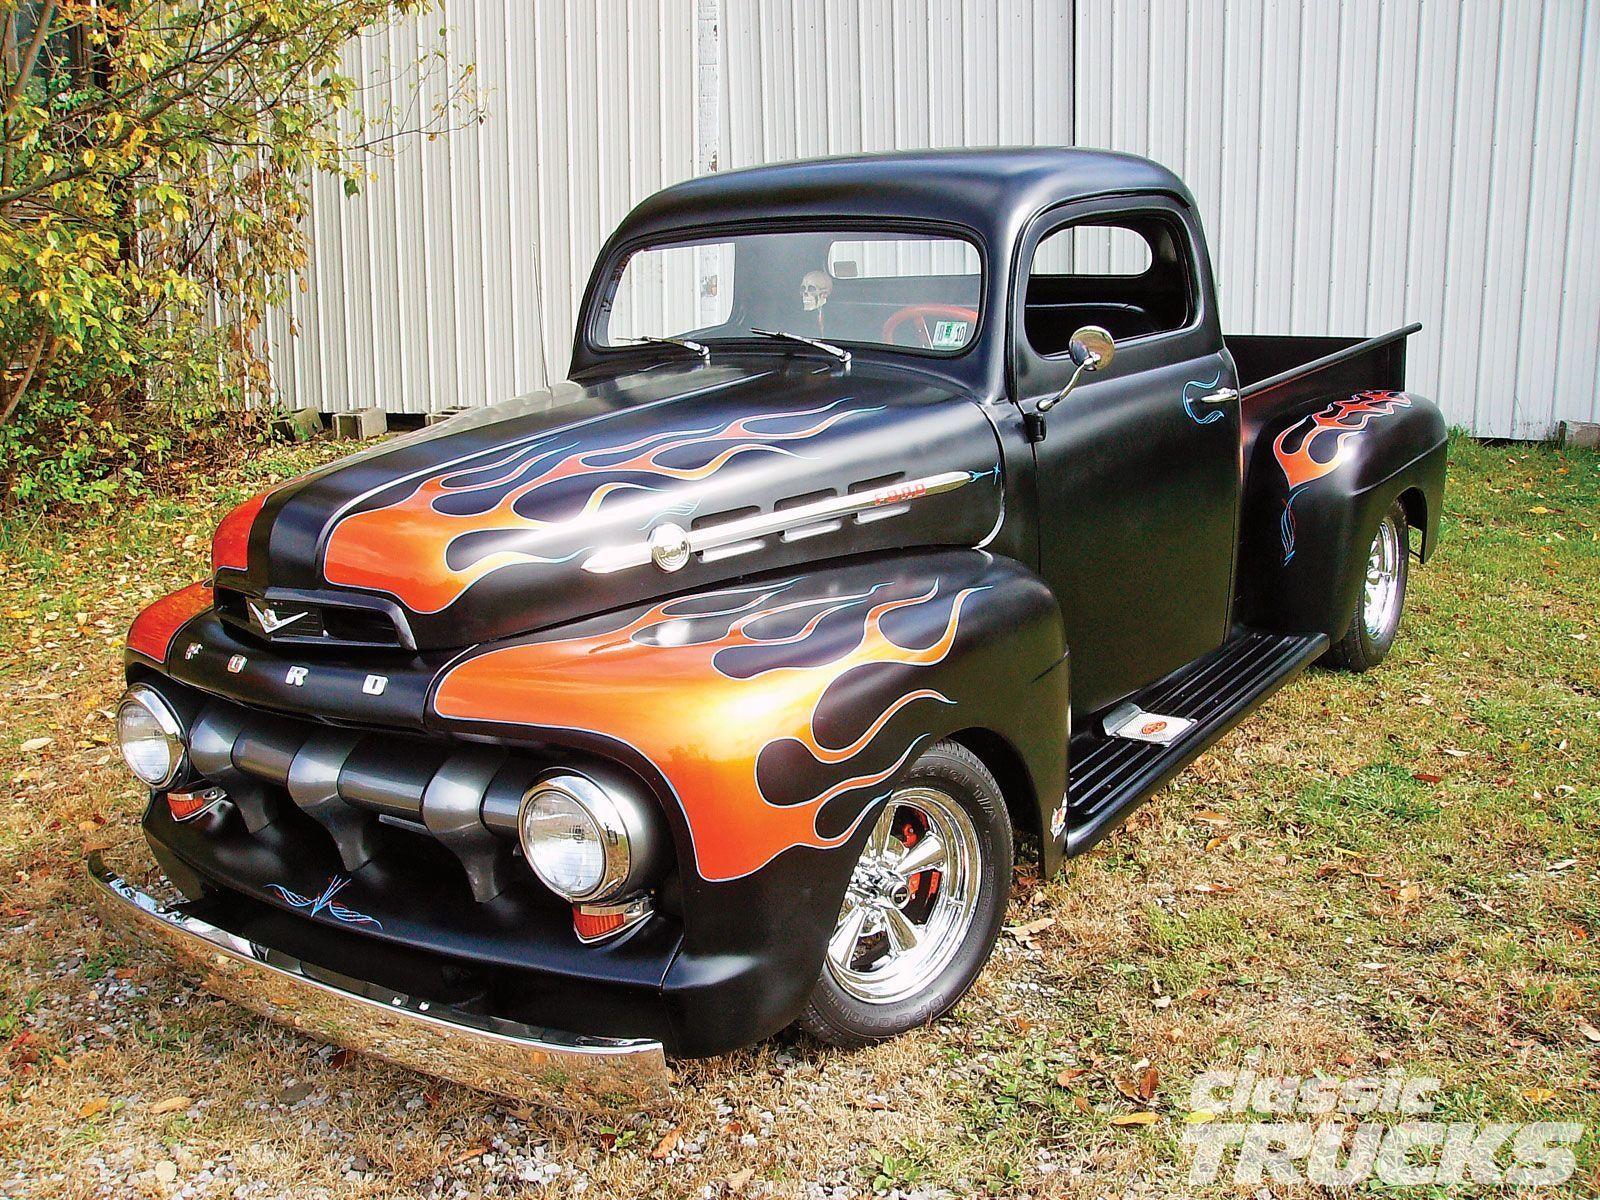 1952 Ford F1 Pickup Hotrod Streetrod Hot Rod Hot Rod Street Flamed Usa 1600x1200 01 Wallpaper 1600x1200 Classic Cars Trucks Old Ford Trucks Classic Trucks